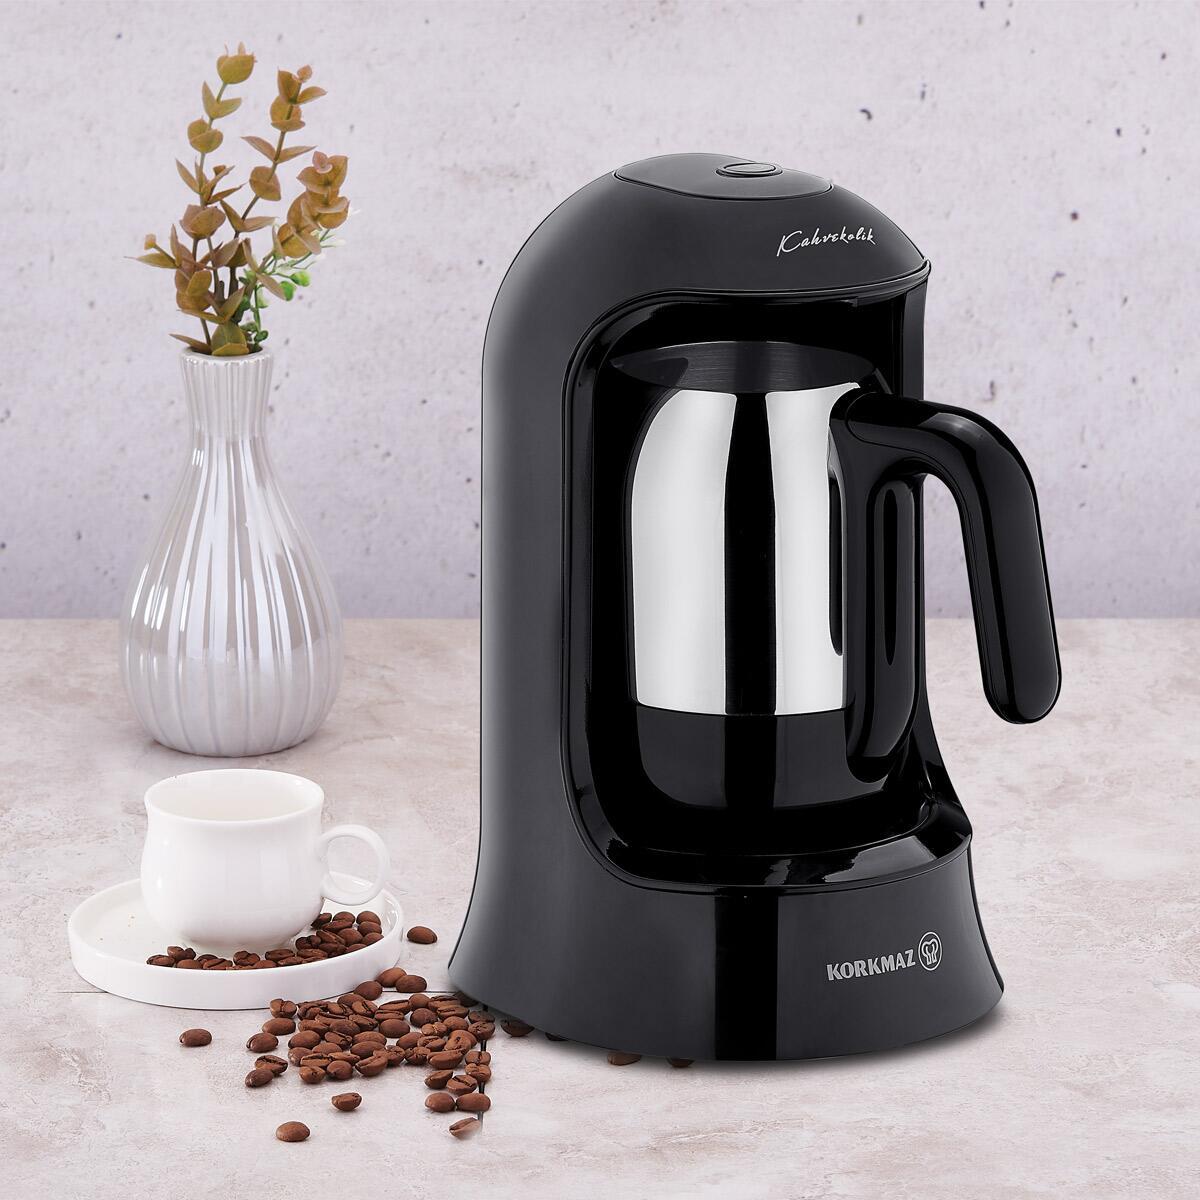 Korkmaz Kahvekolik Nero Otomatik Kahve Makinesi